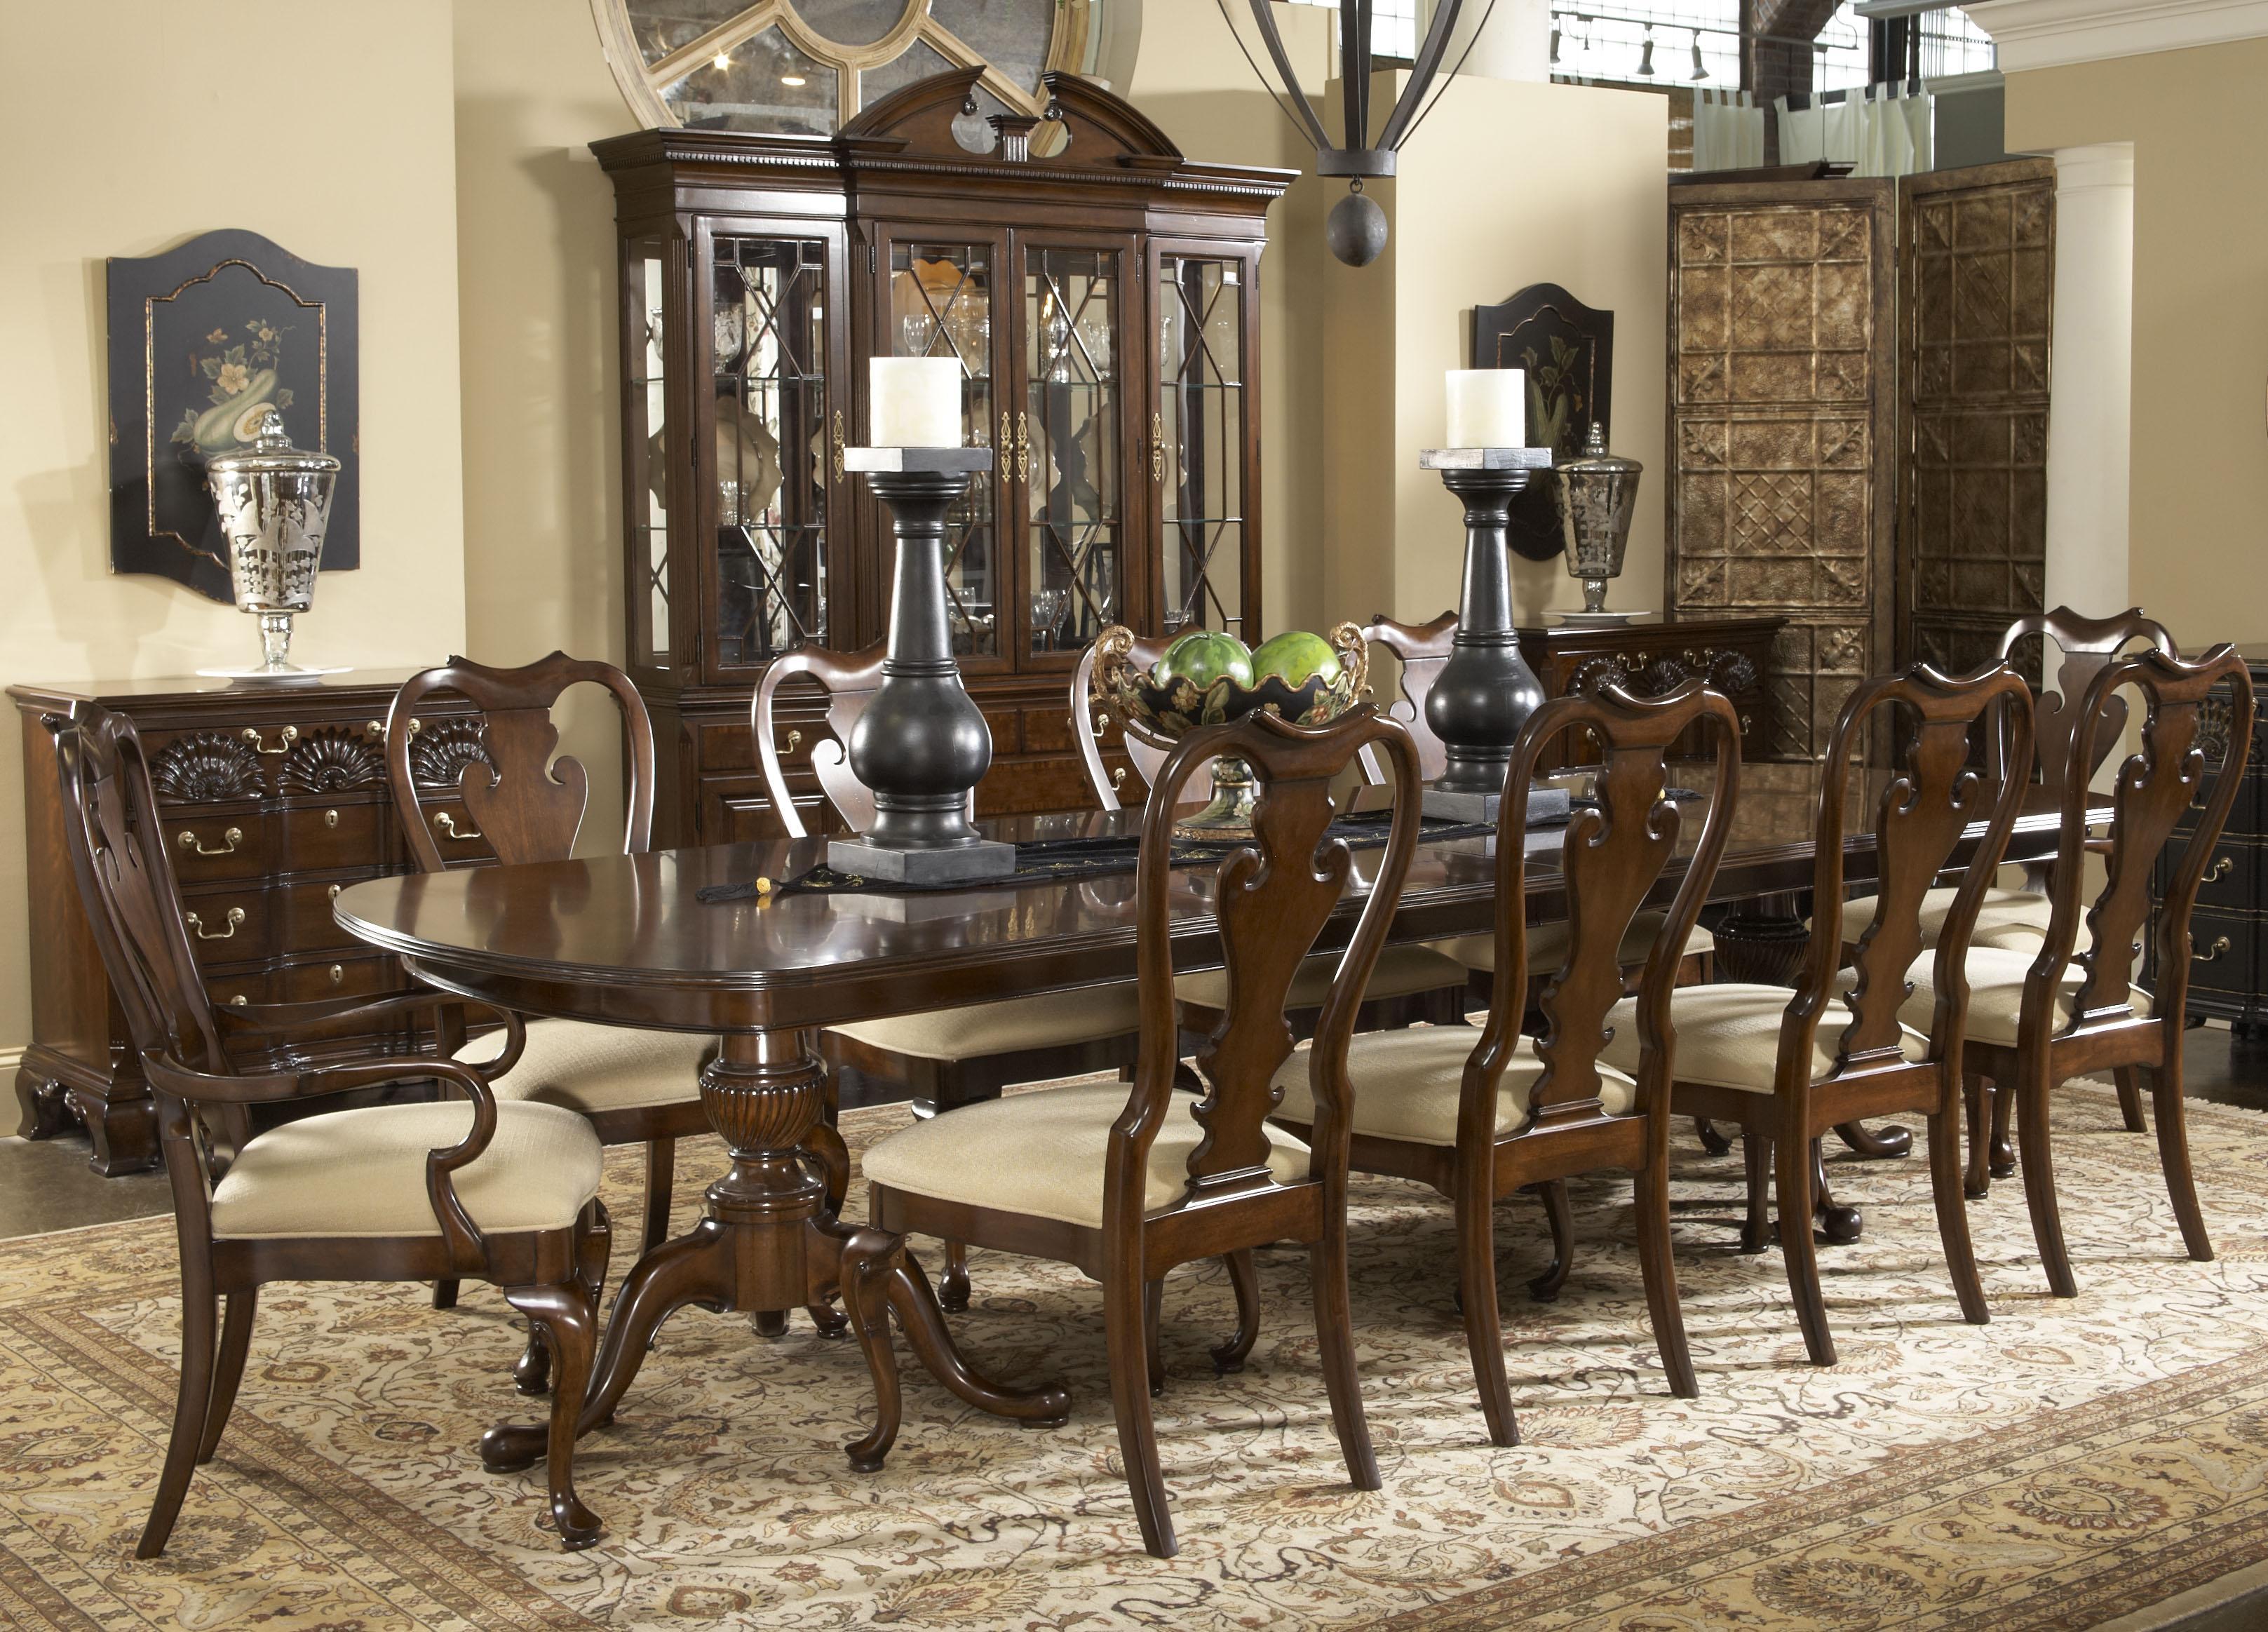 title | Dining room sets